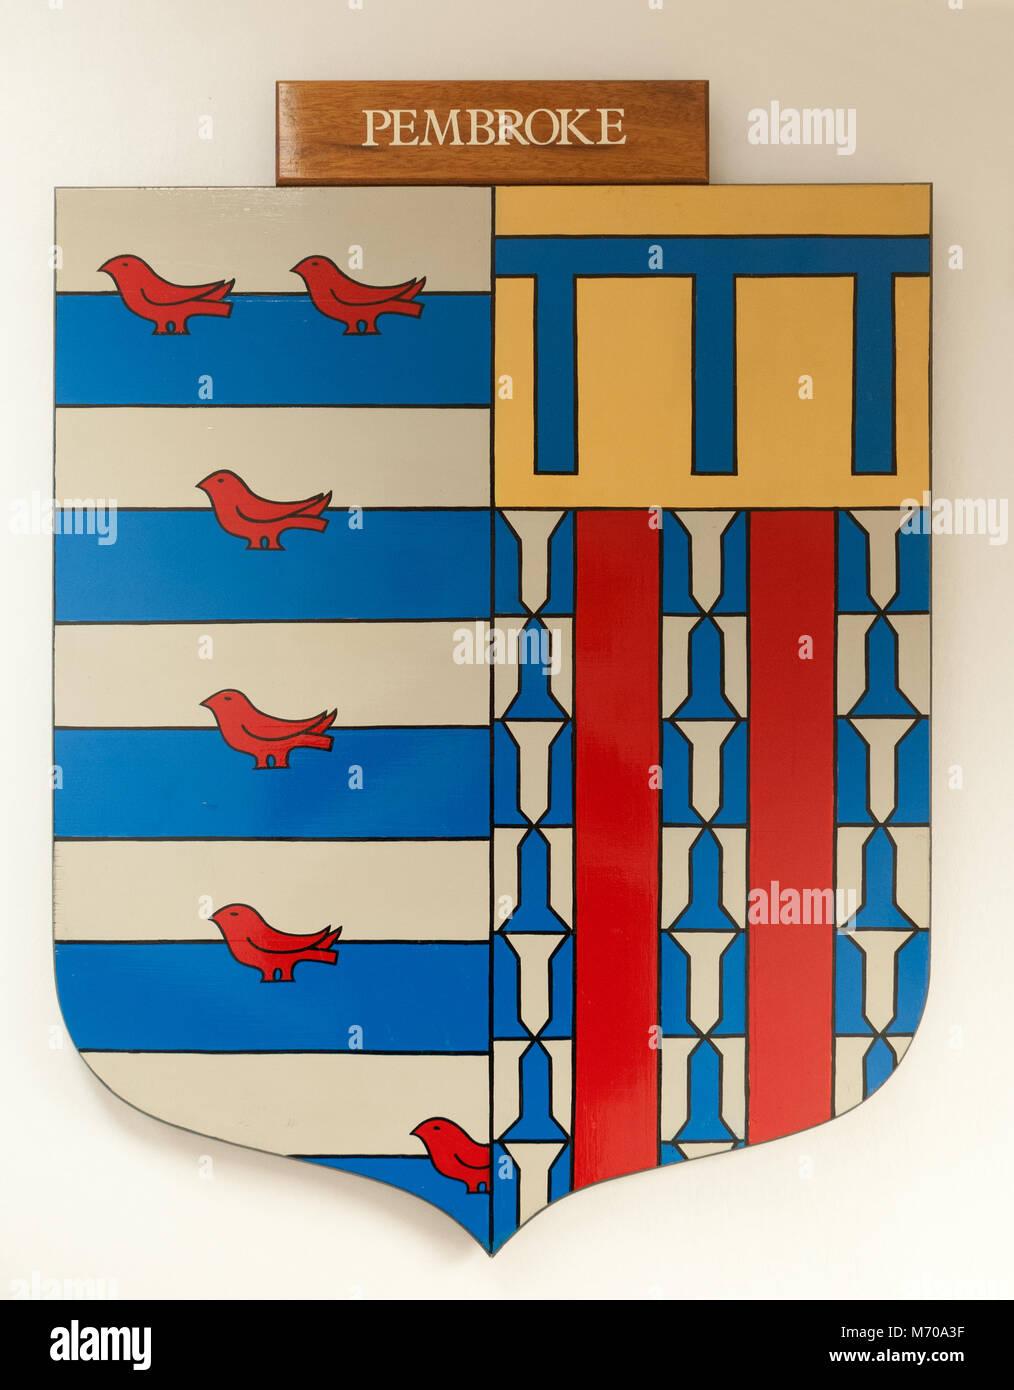 CAMBRIDGE, ENGLAND, UK - DECEMBER 03 2011 - Coat of Arms of Pembroke College, Cambridge University - Stock Image